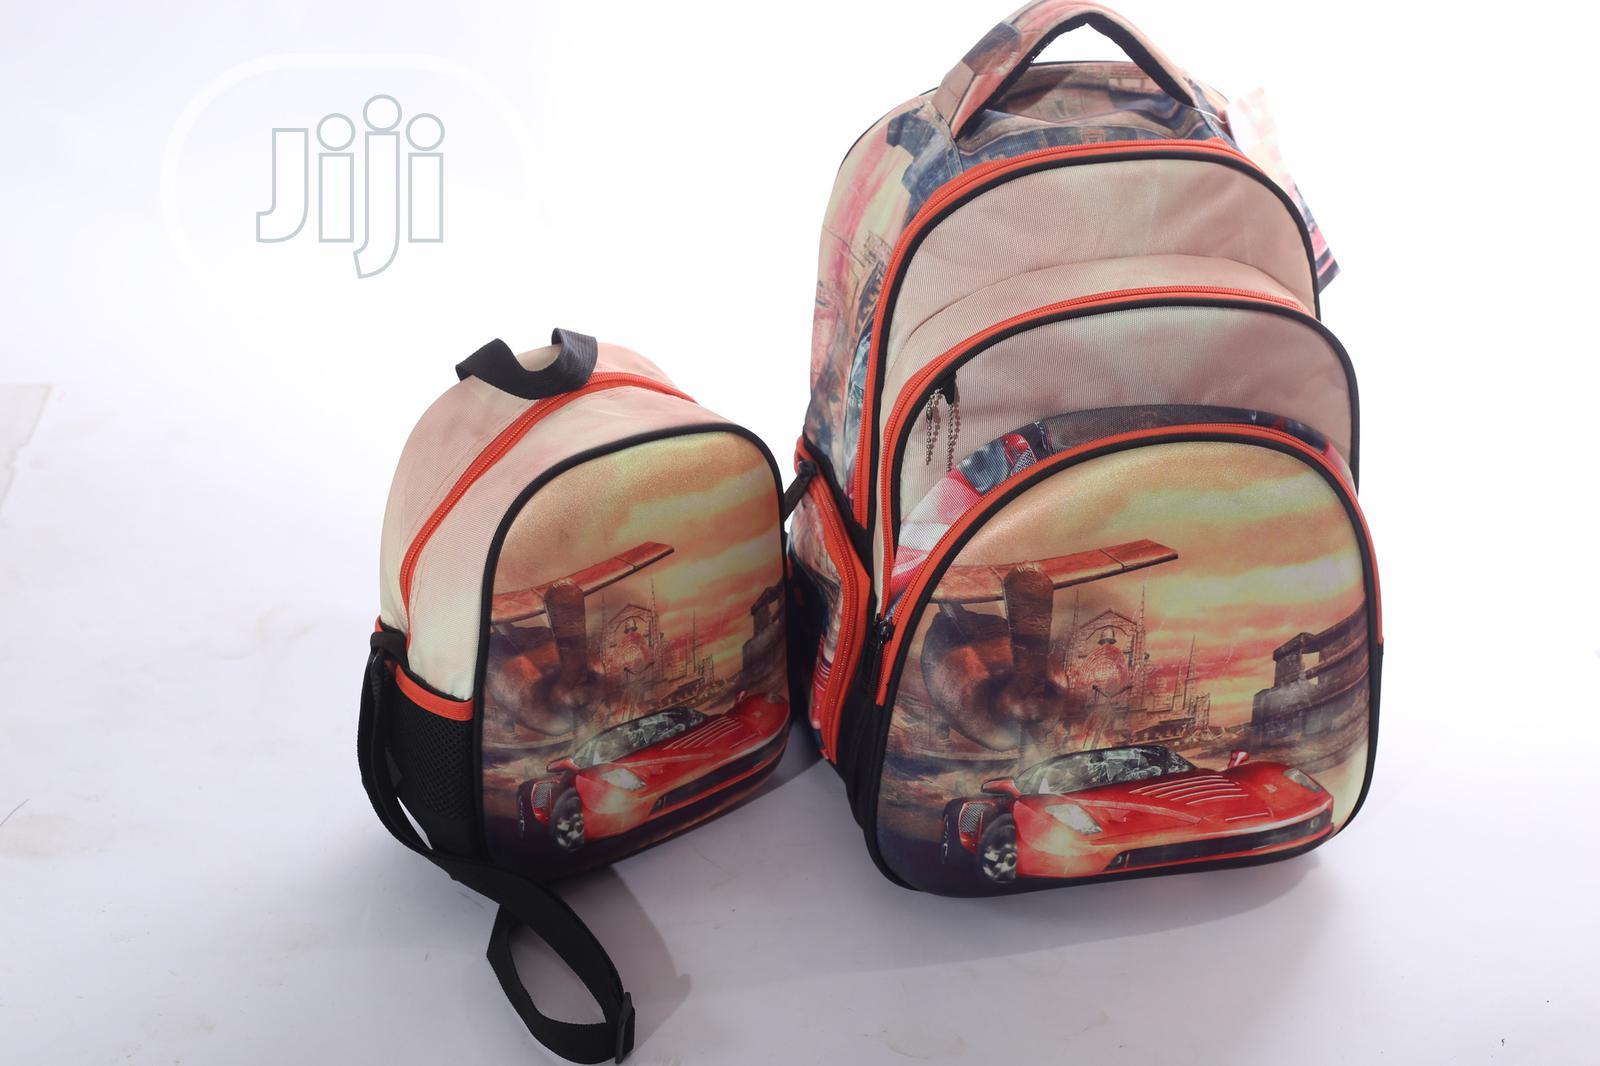 Glossy Bird 3 in 1 School Bag   Babies & Kids Accessories for sale in Alimosho, Lagos State, Nigeria